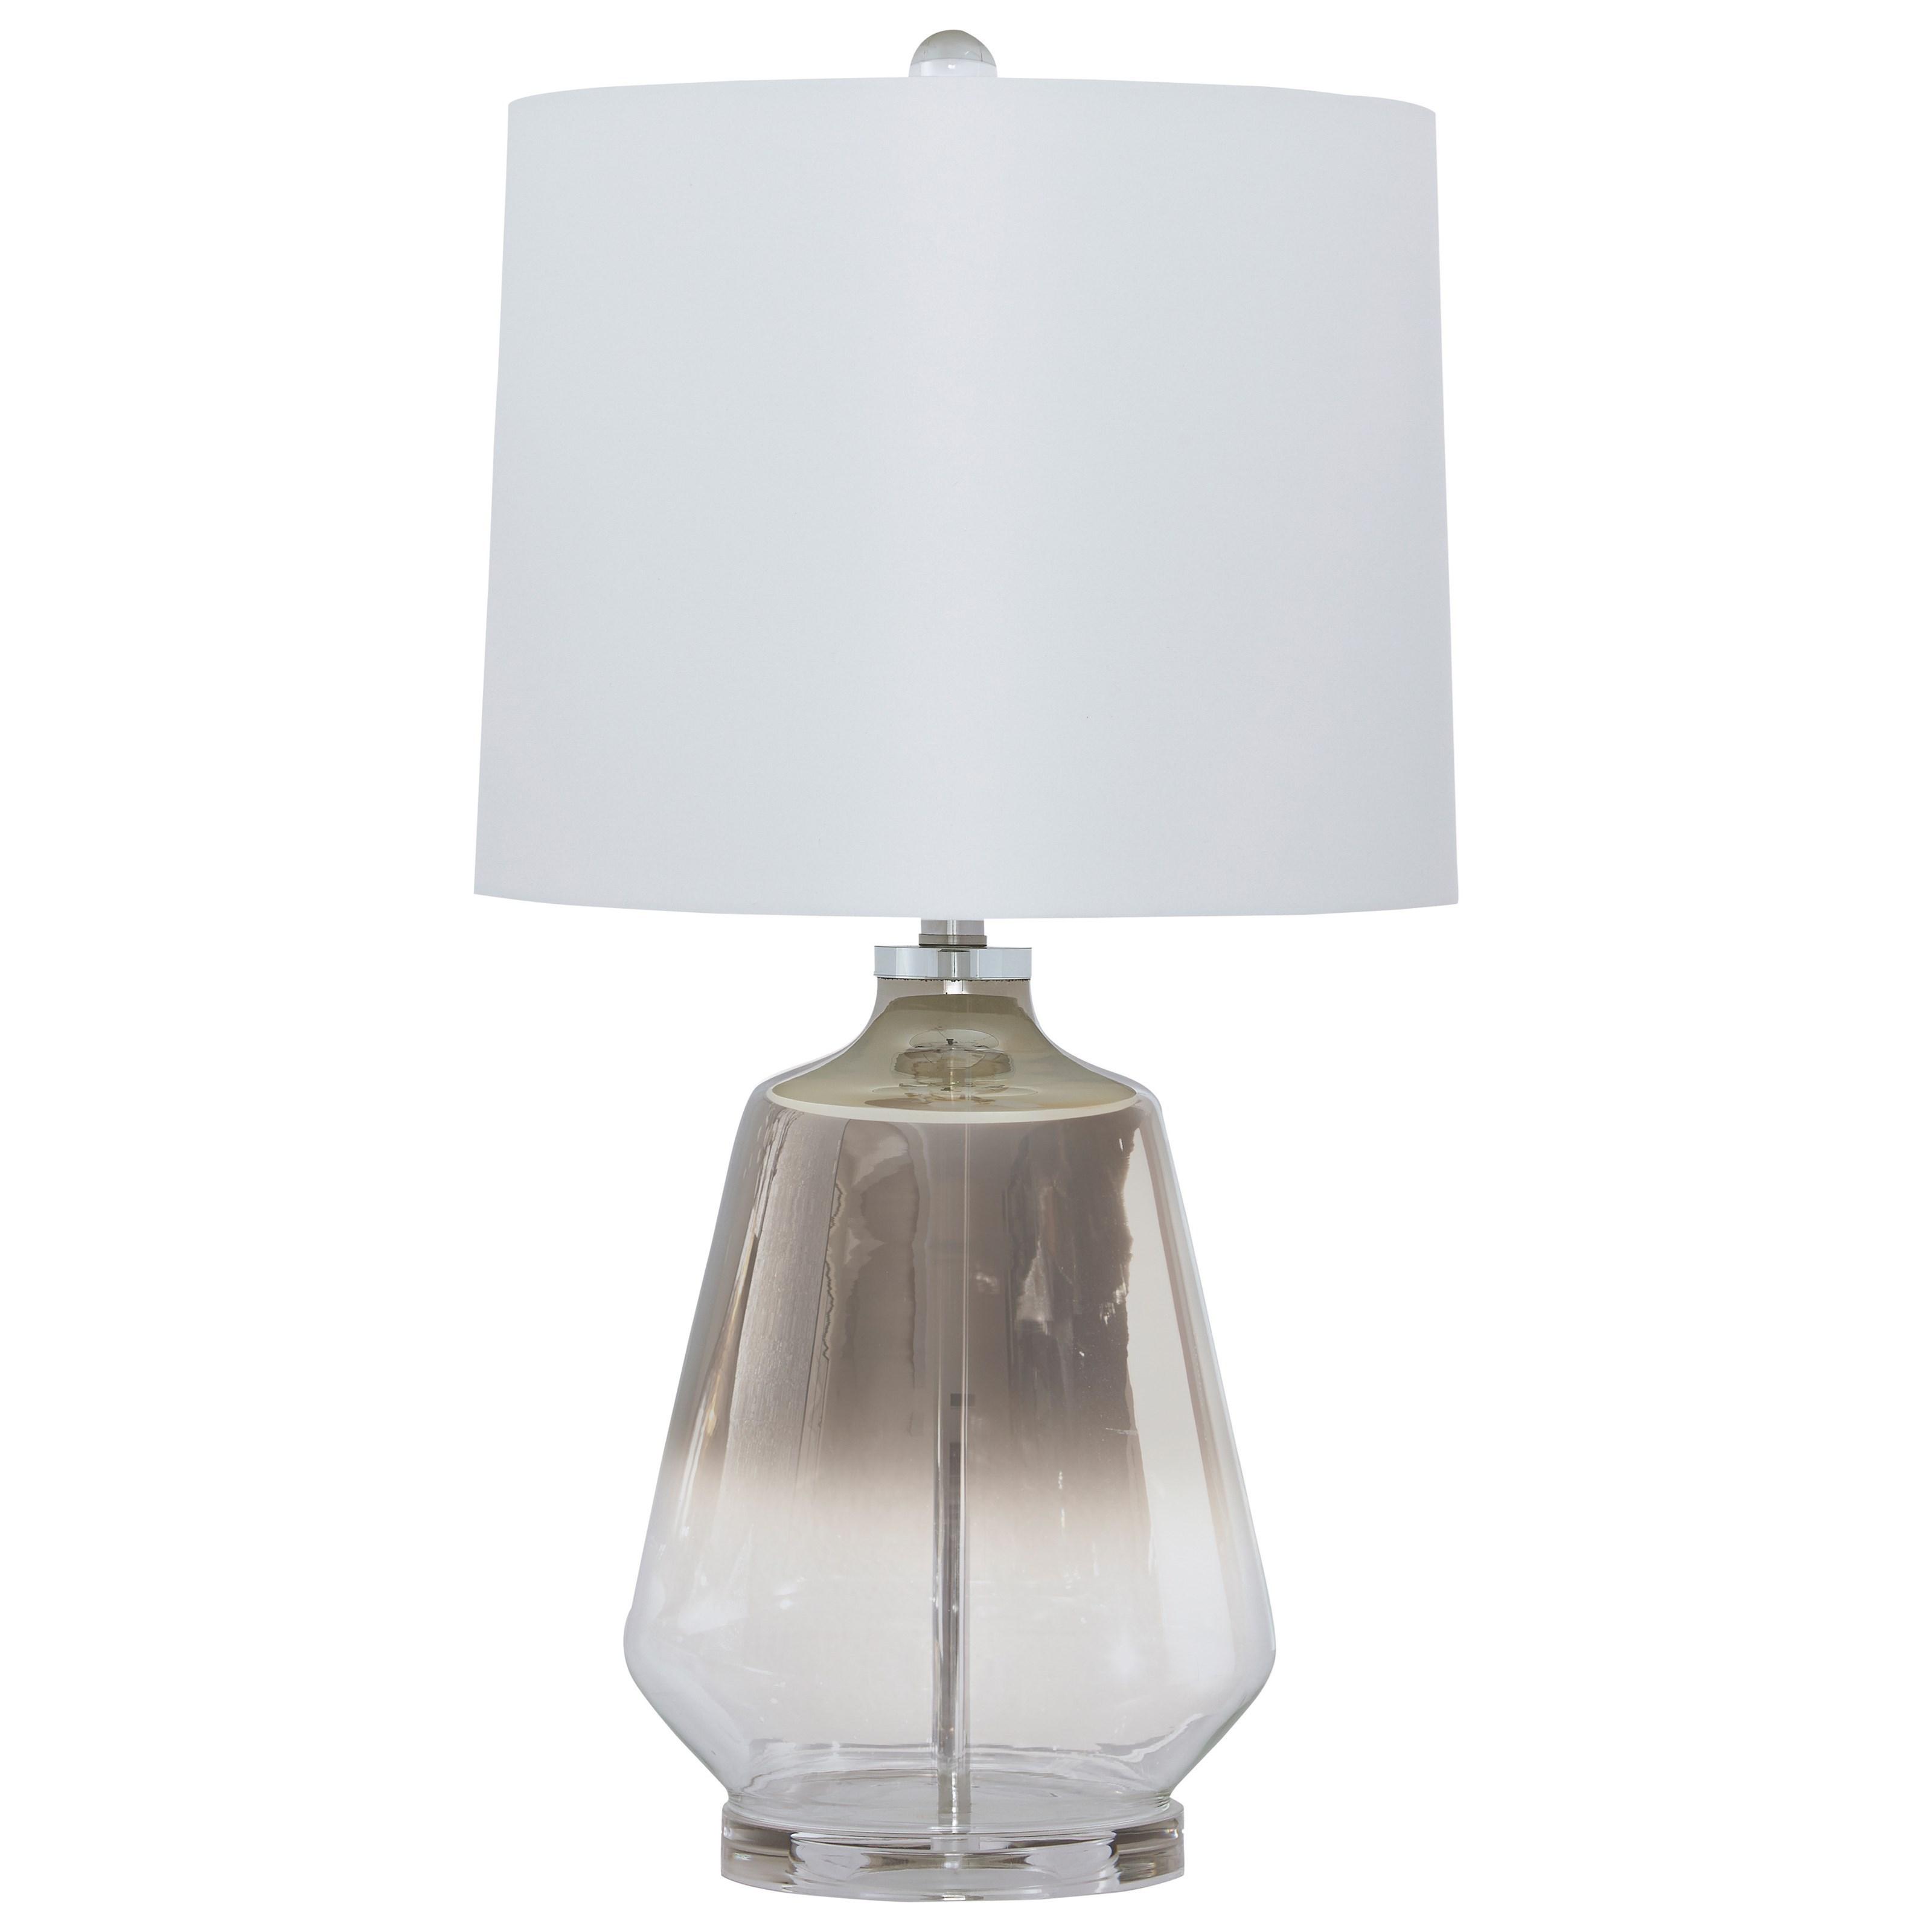 Jaslyn Glass Table Lamp